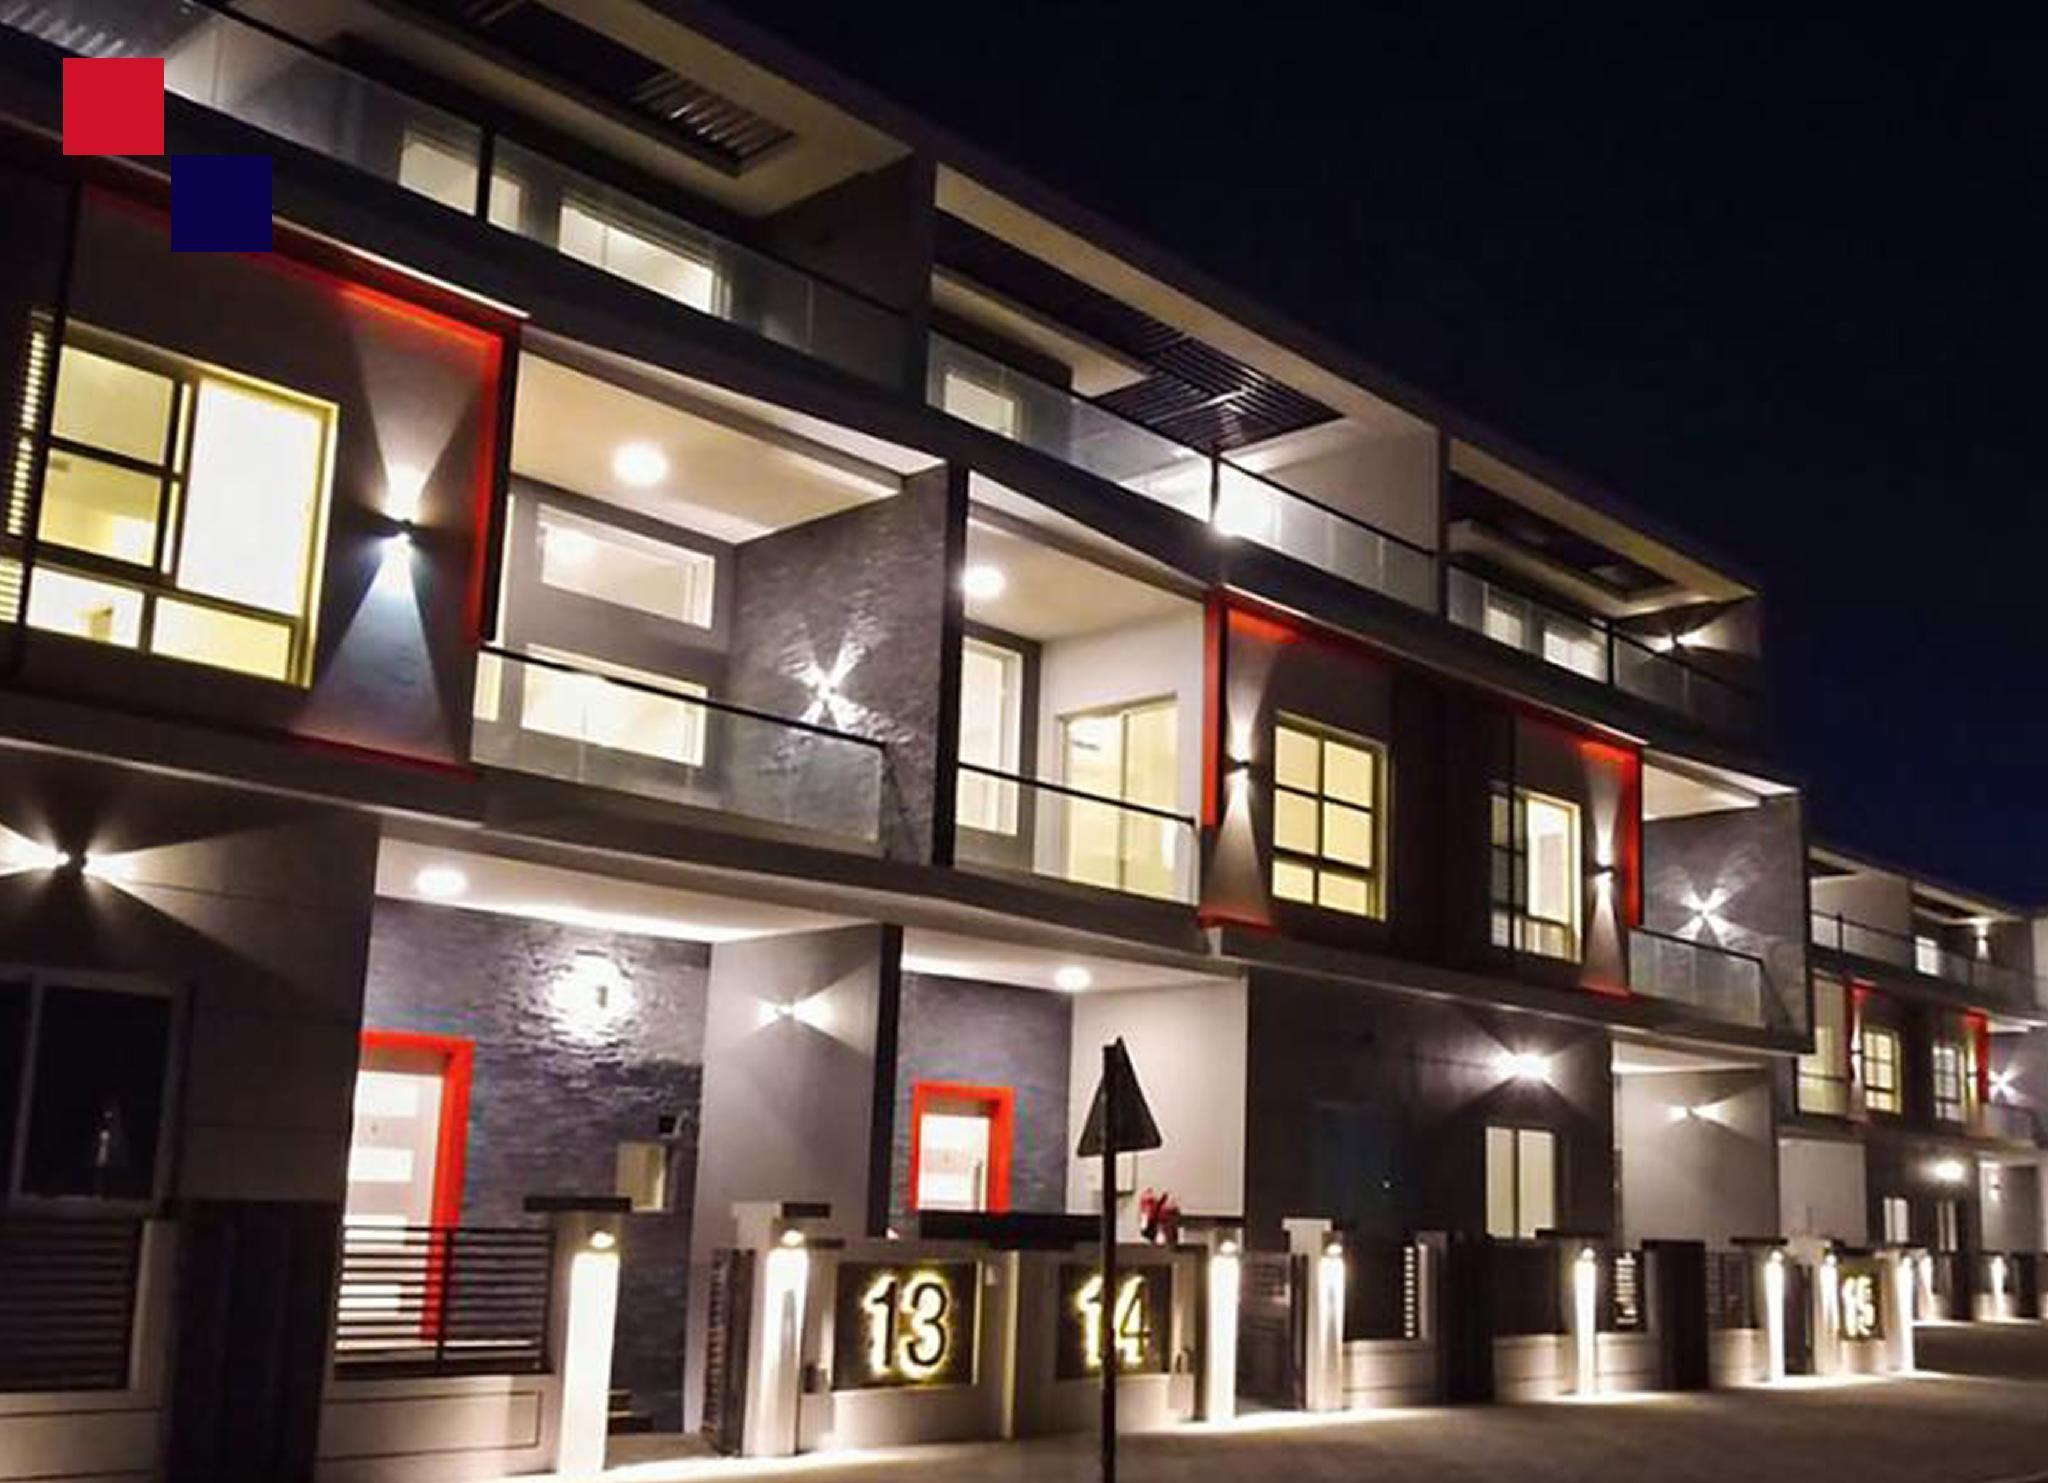 KAY Homes Villas Ras Al Khaimah